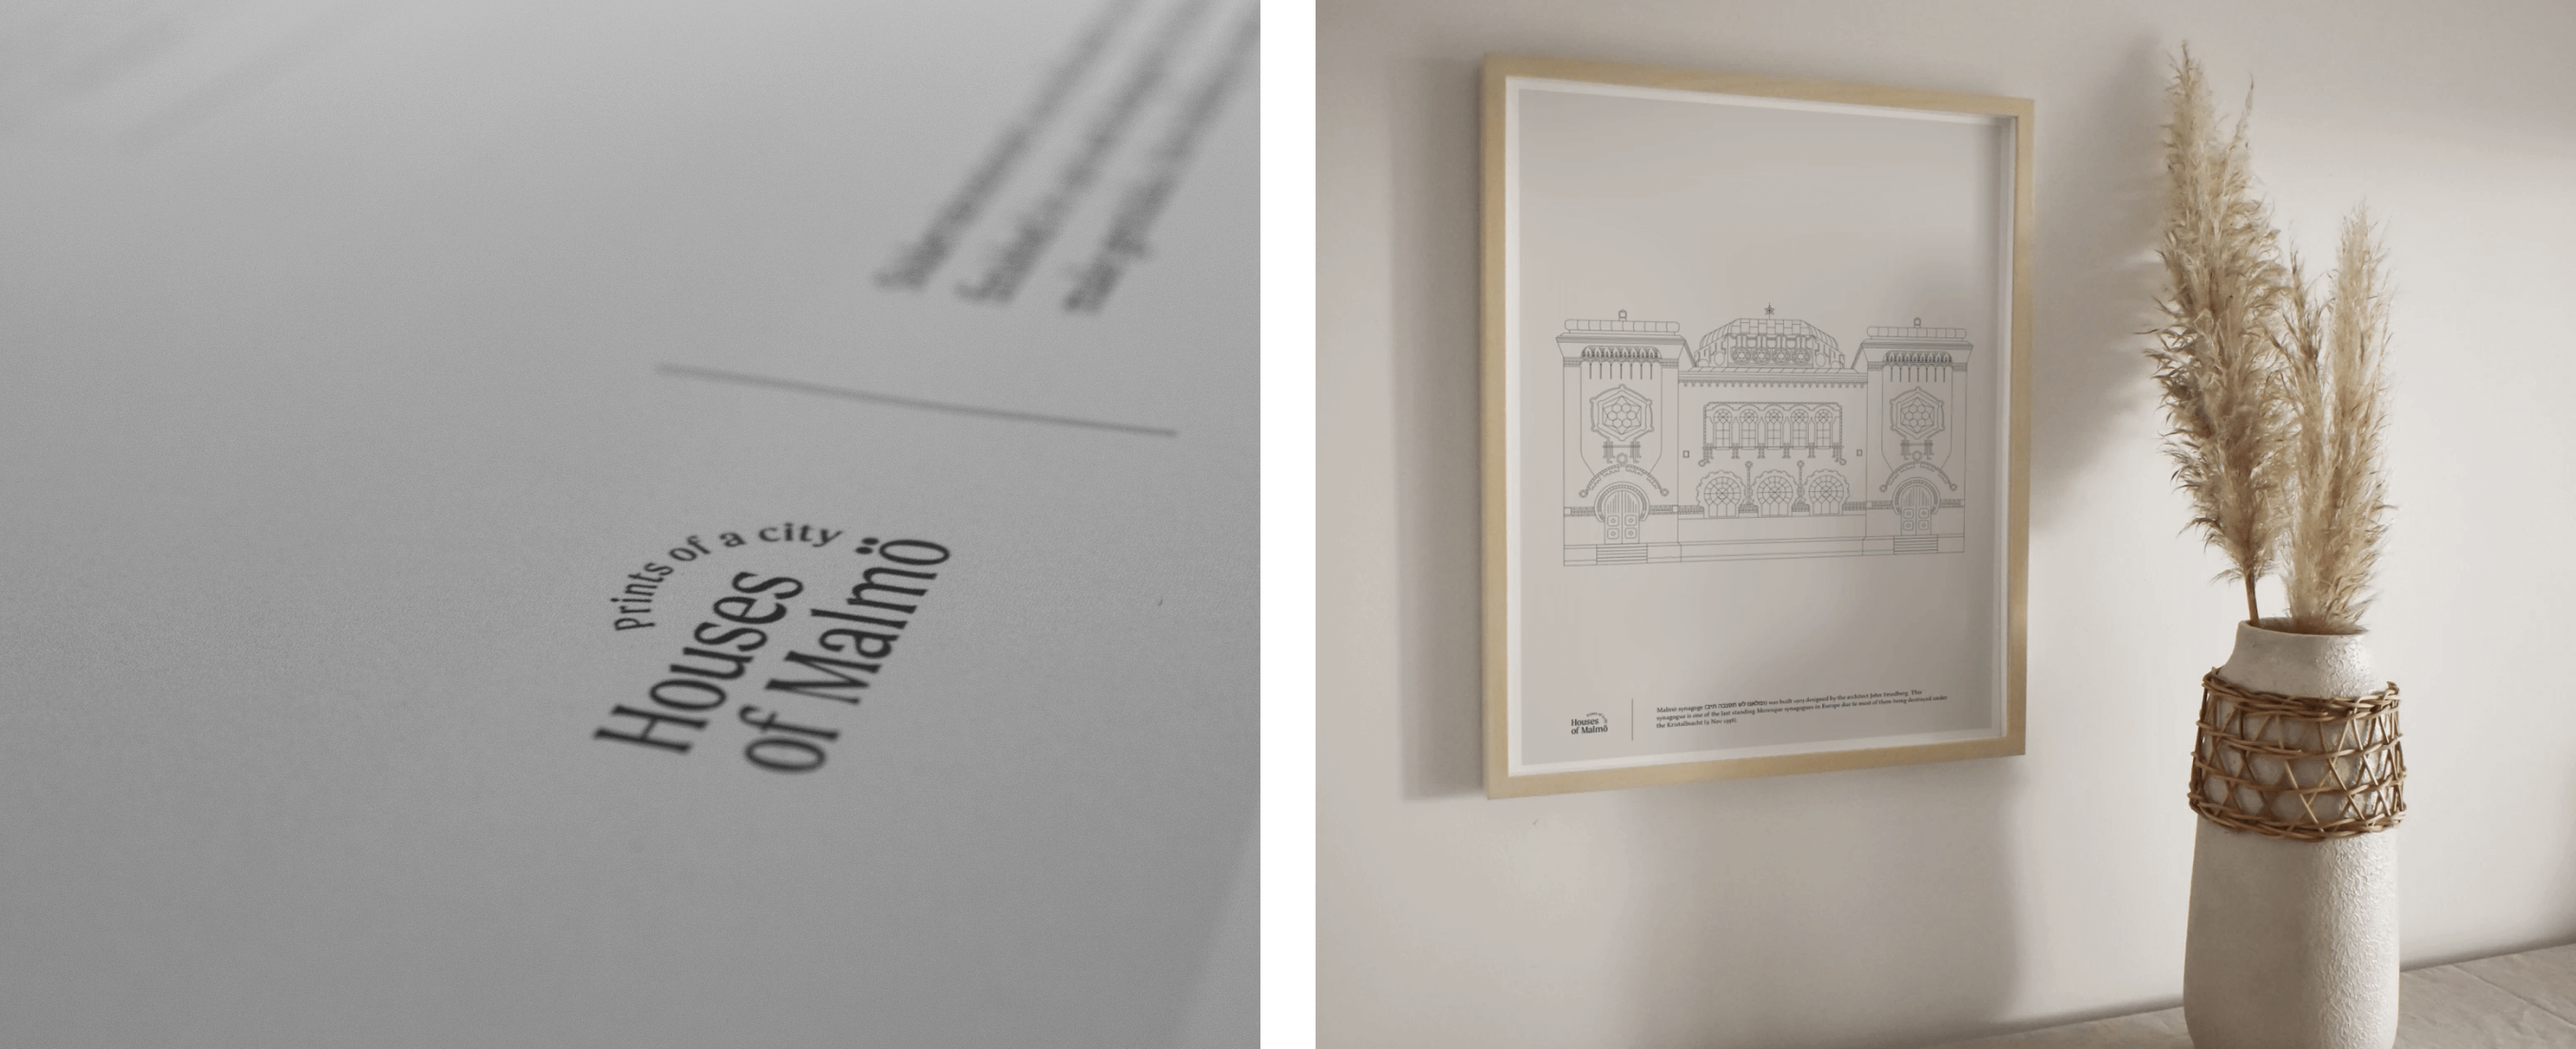 Mockups of HoM prints